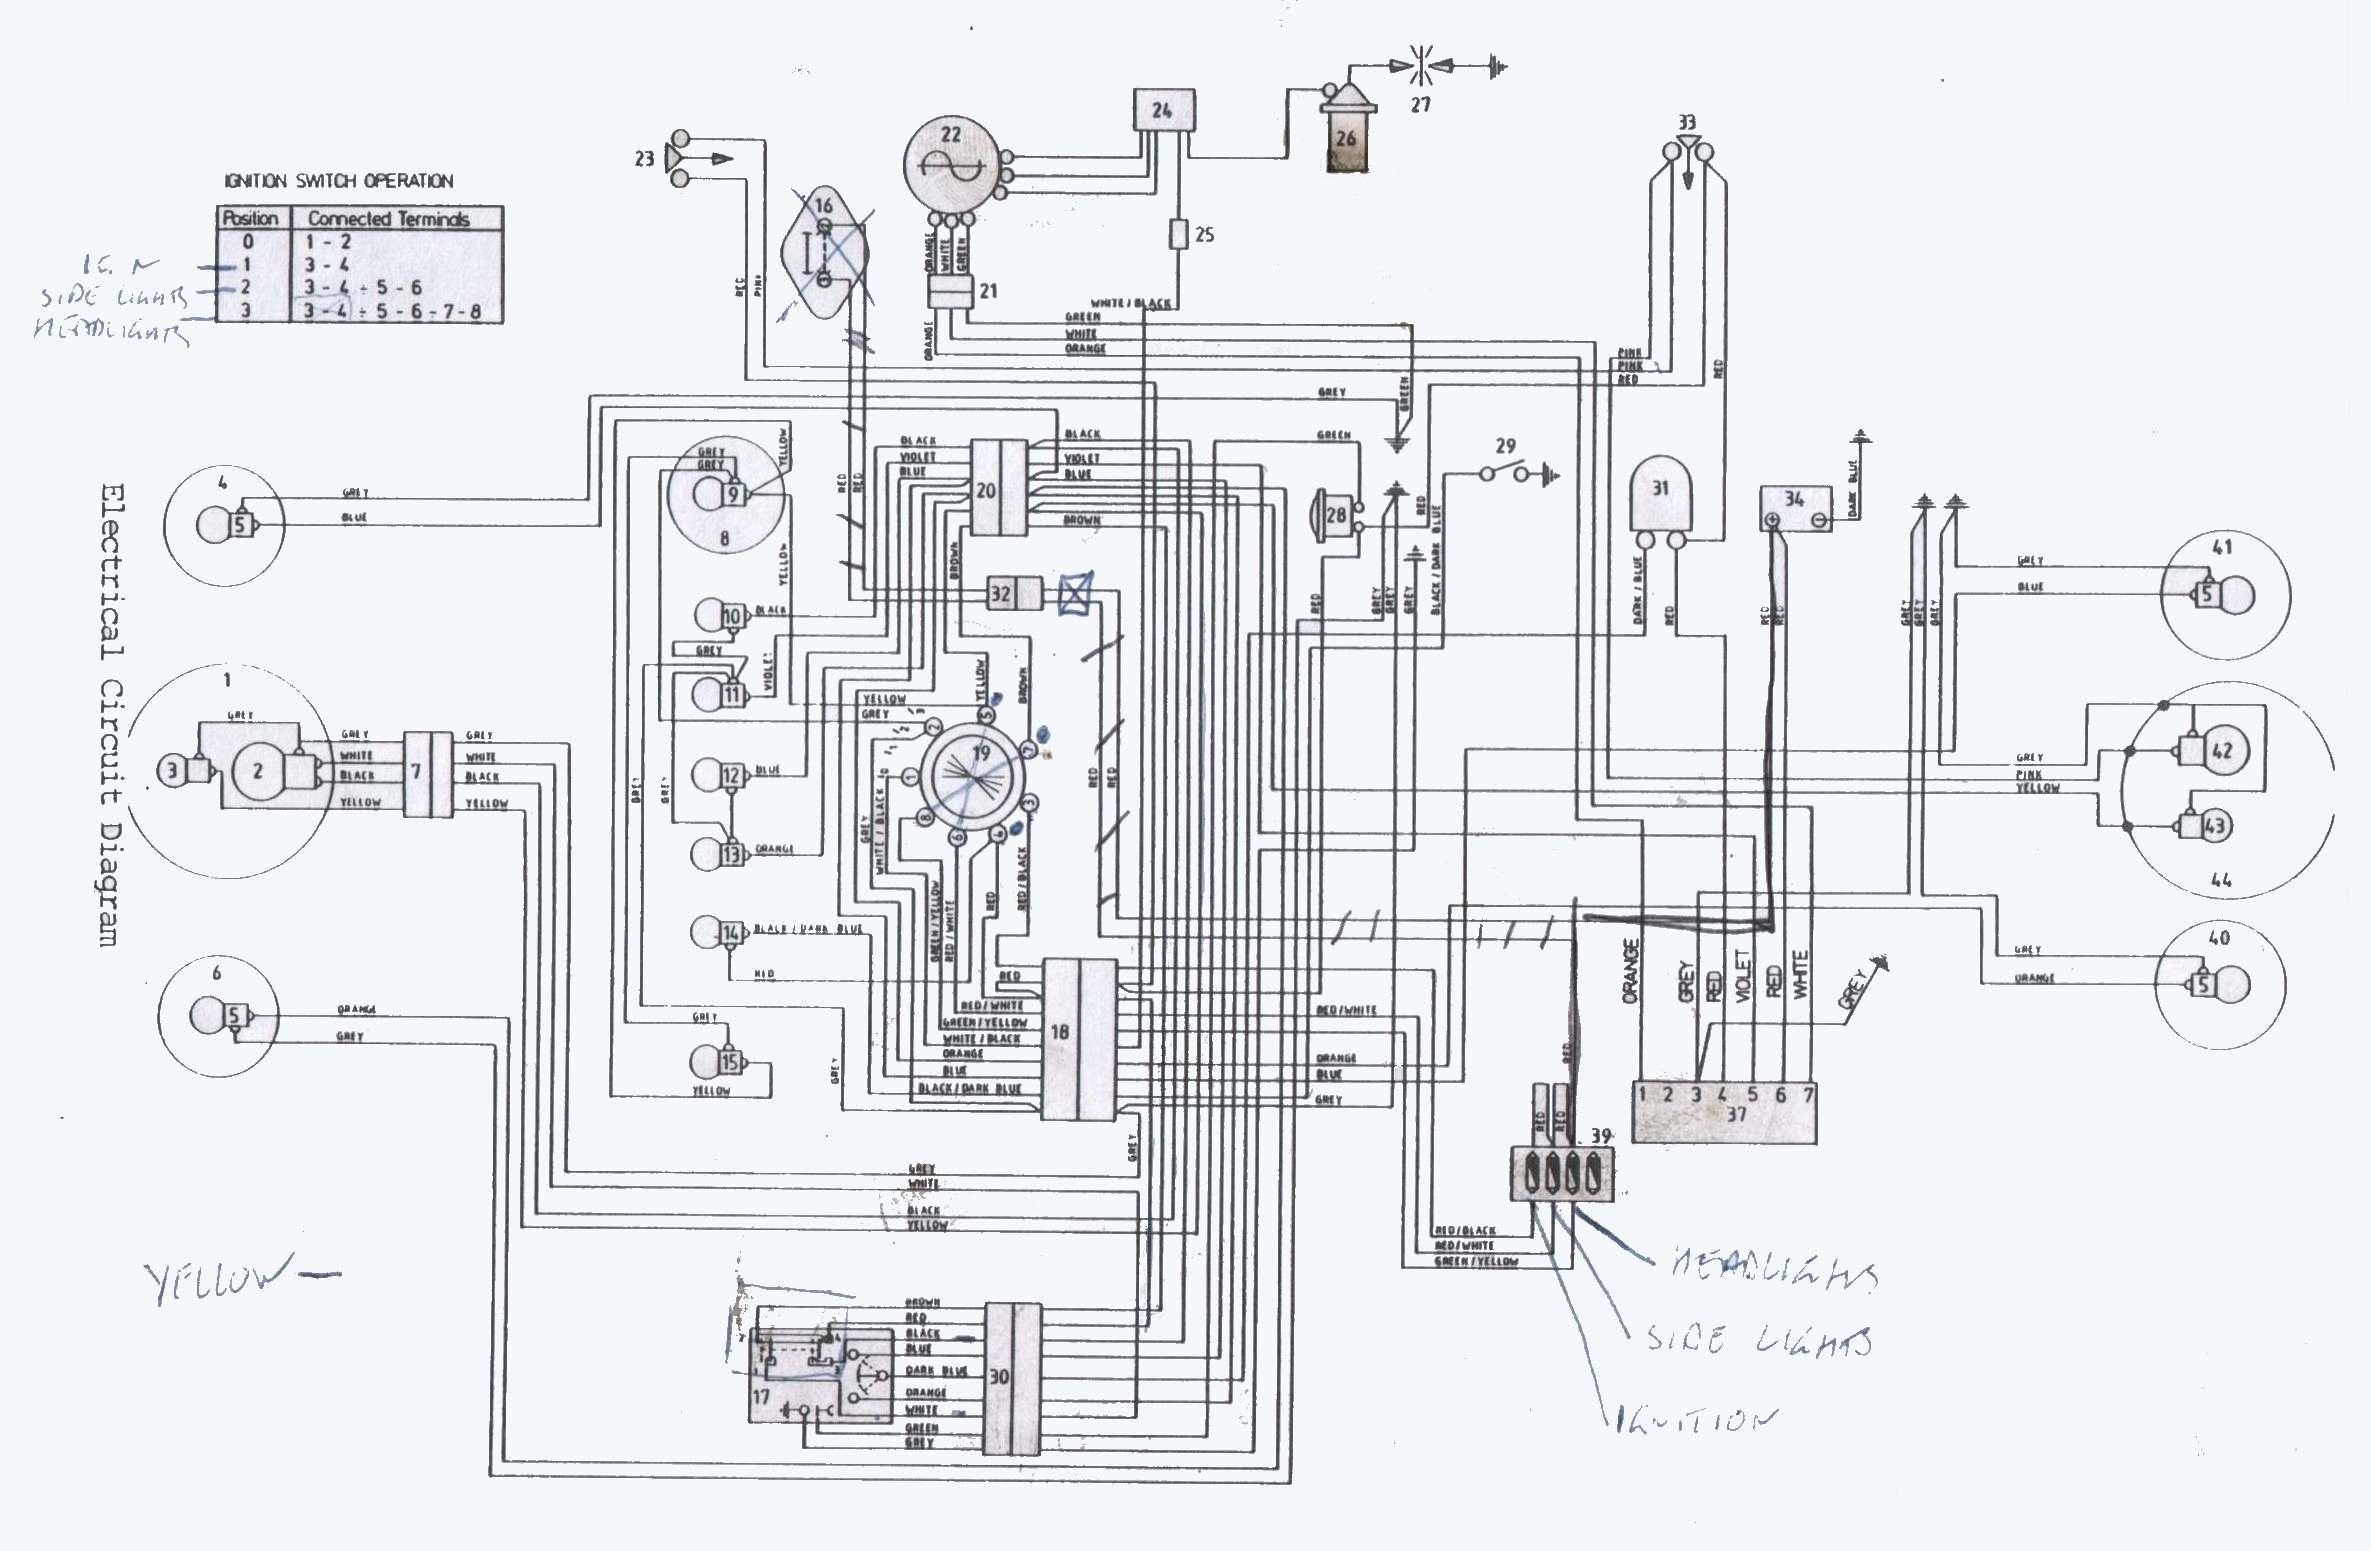 norton commando wiring diagram 1986 mazda b2000 radio dan 39s motorcycle quotvarious systems and diagrams quot